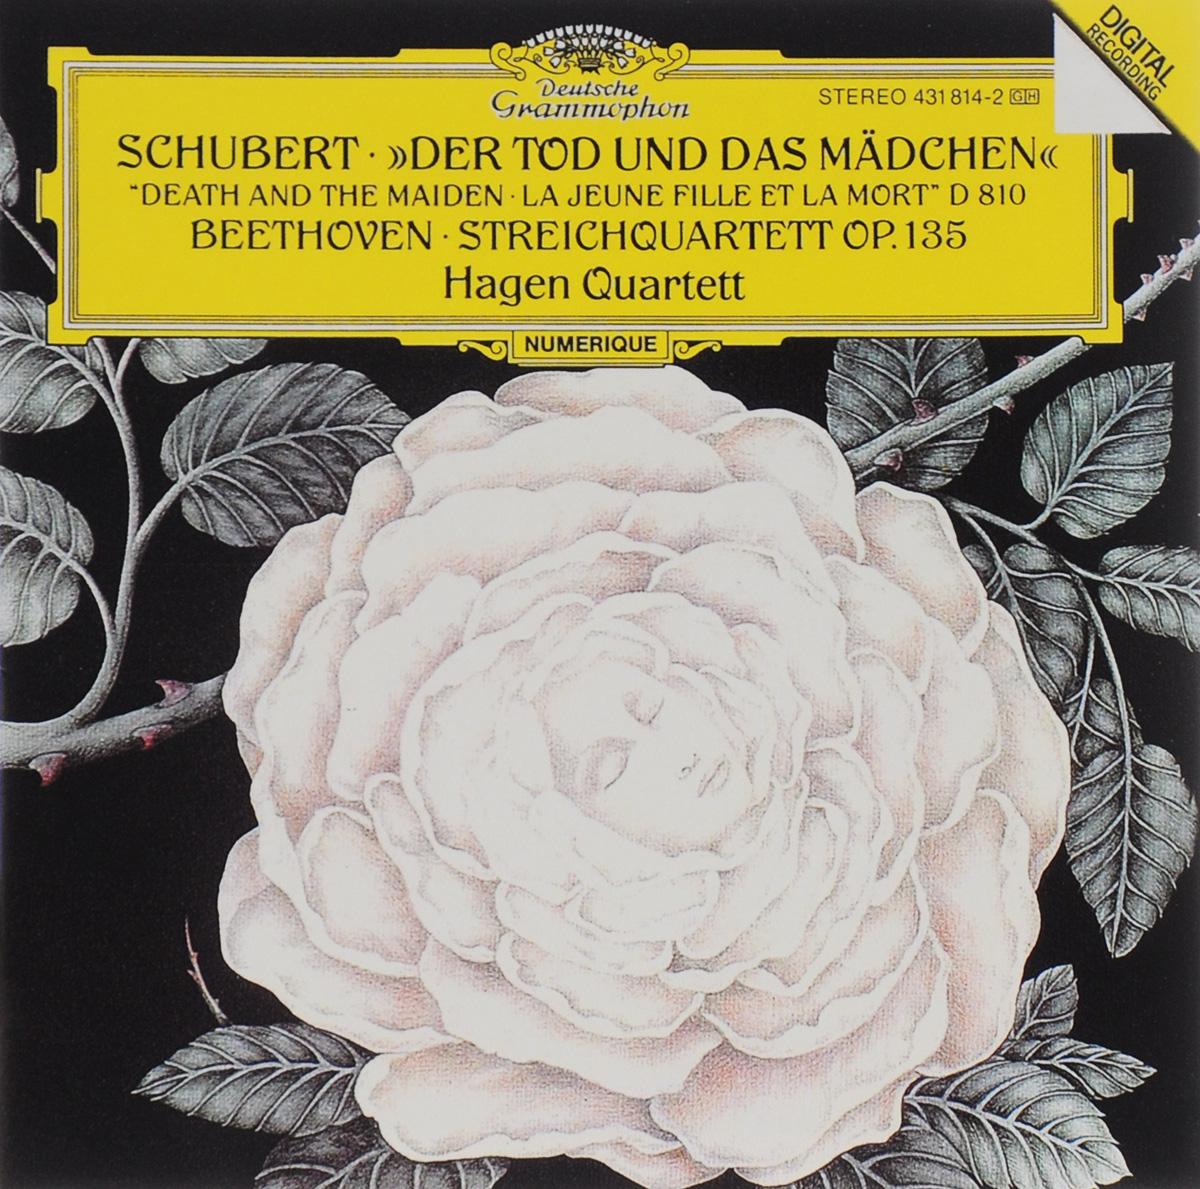 Hagen Quartett Hagen Quartett. Schubert. Der Tod Und Das Madchen / Beethoven. Streichquartett Op. 135 скатерть дорожка глория рюшаль